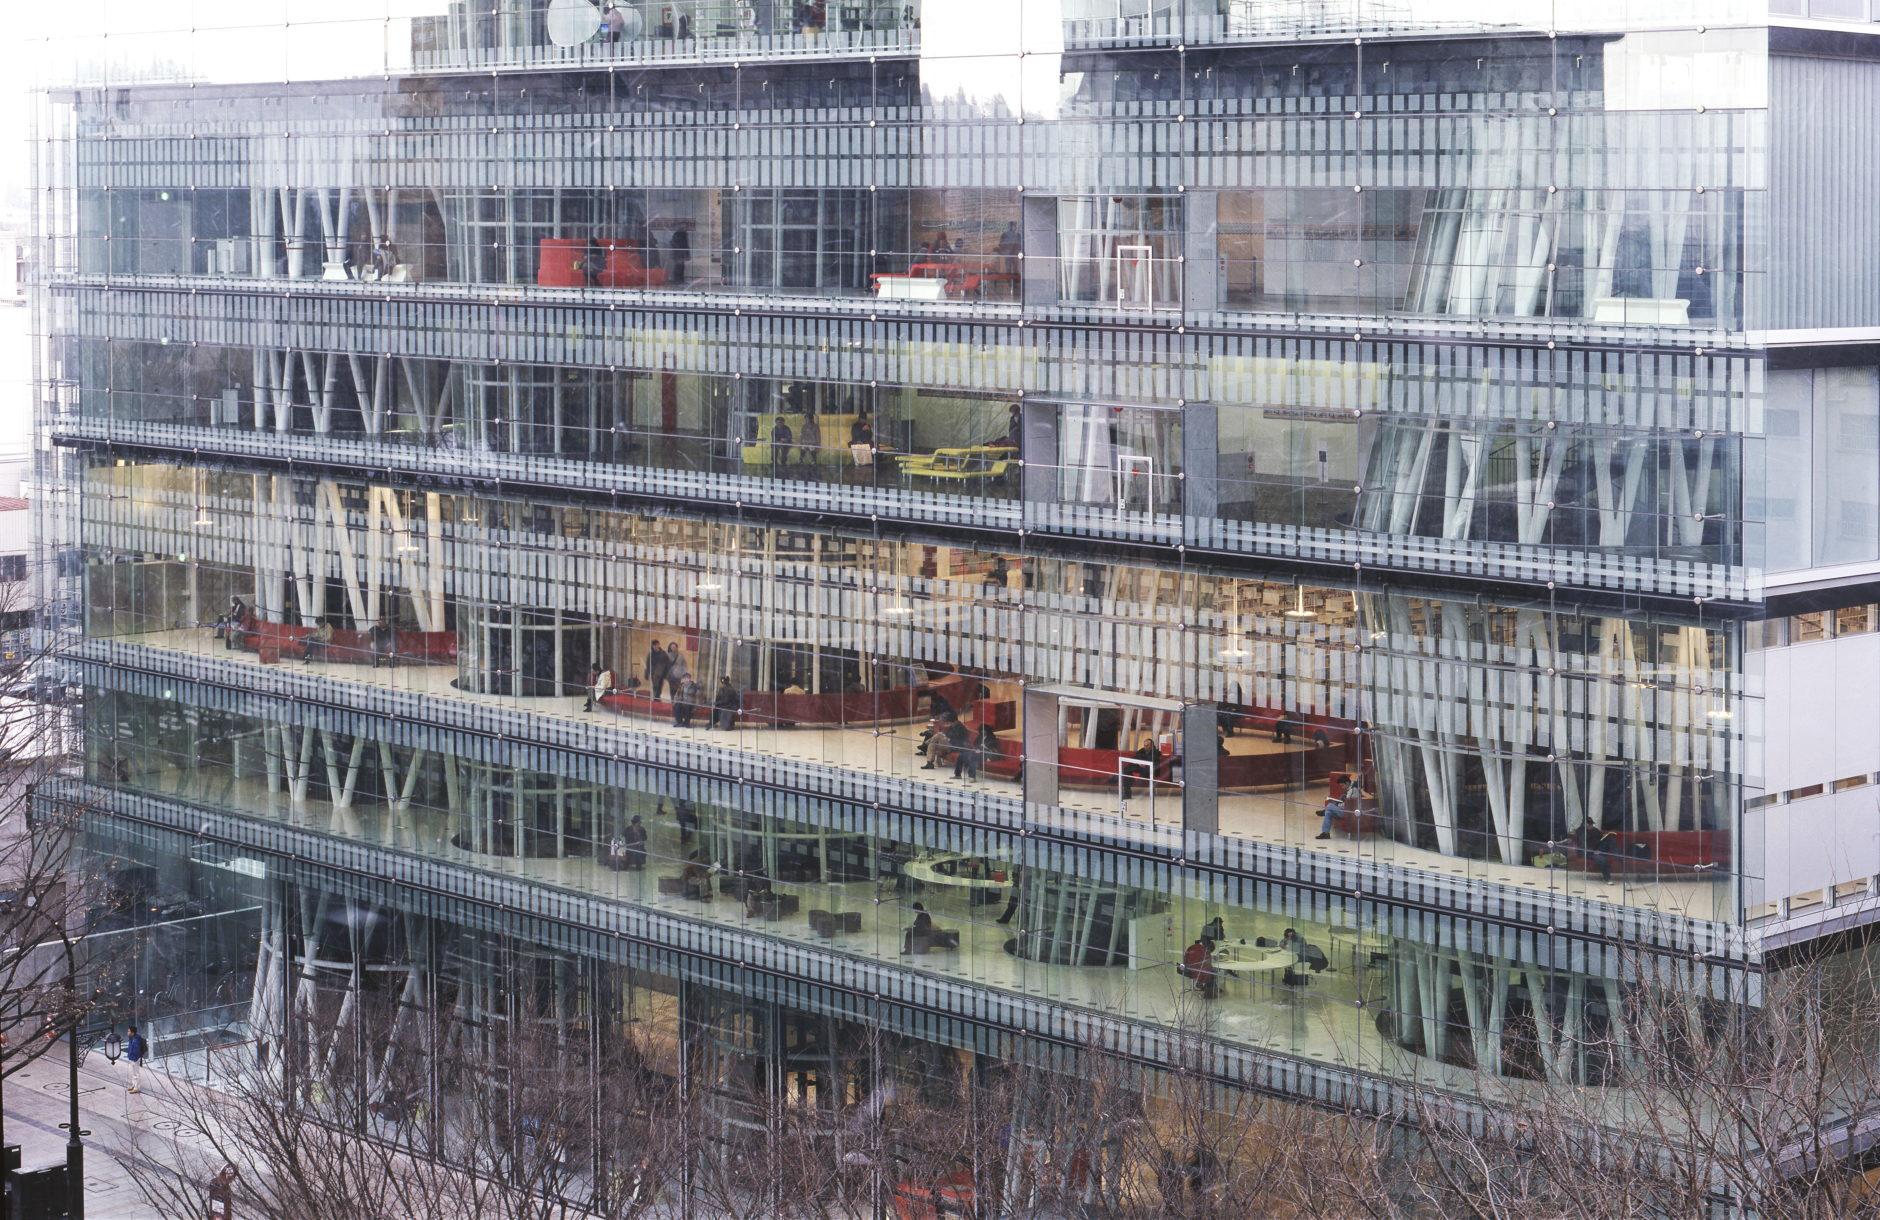 Toyo Ito & Associates Architects, Sendai Mediatheque, 1995-2000, Sendai-shi, Miyagi, Japan. Photo: Tomio Ohashi.